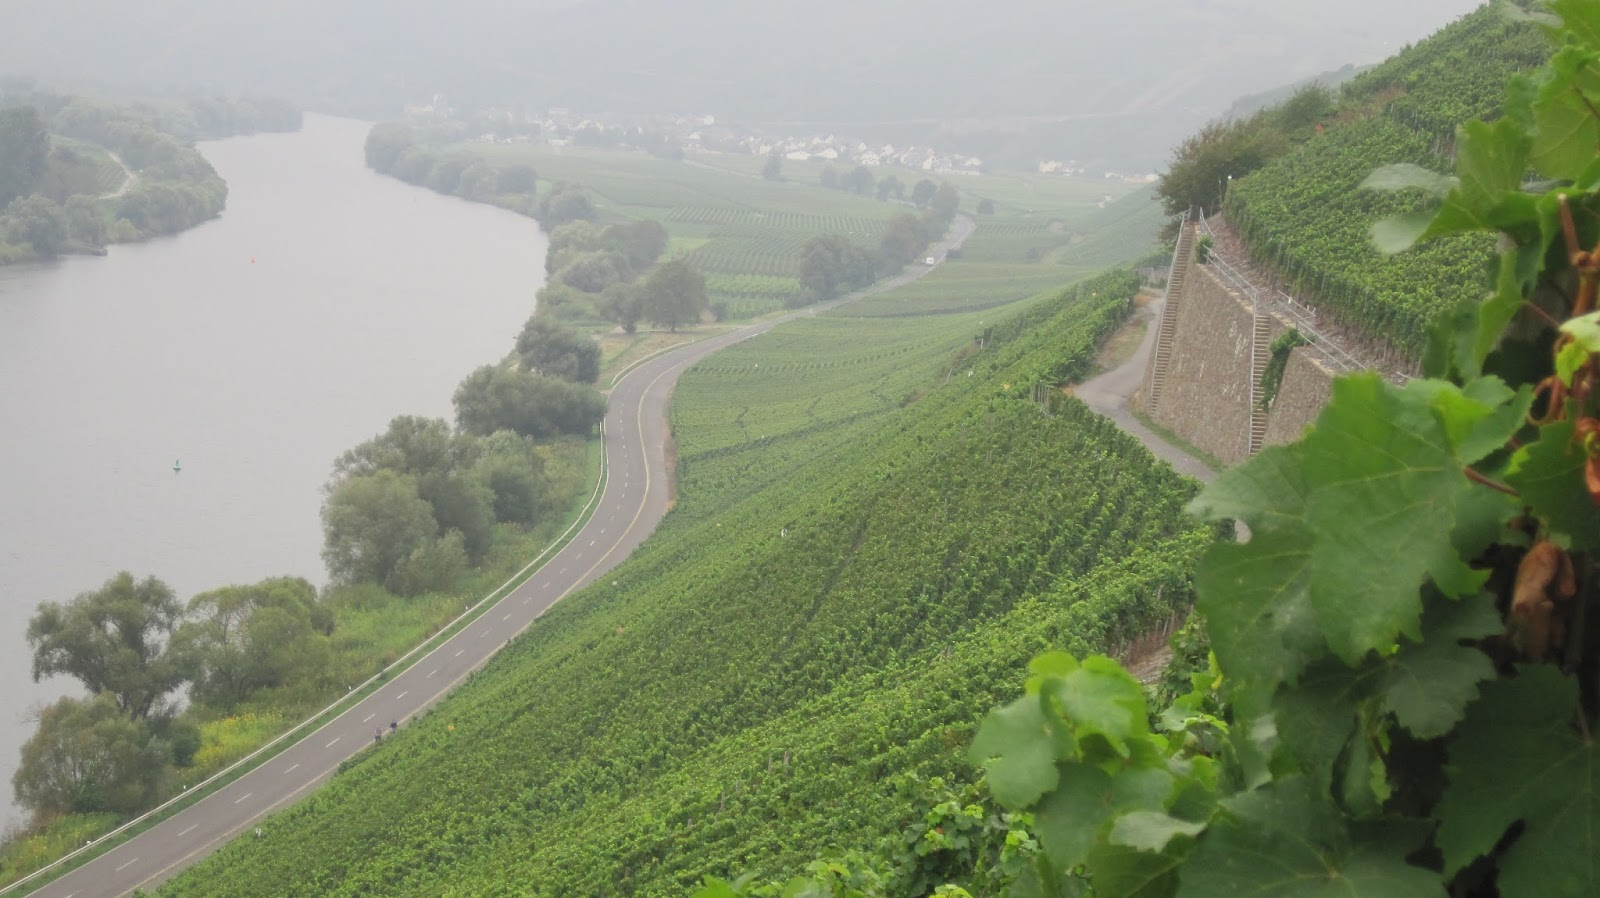 Ahr, Moezel en Pfalz uit ingepakte flessen